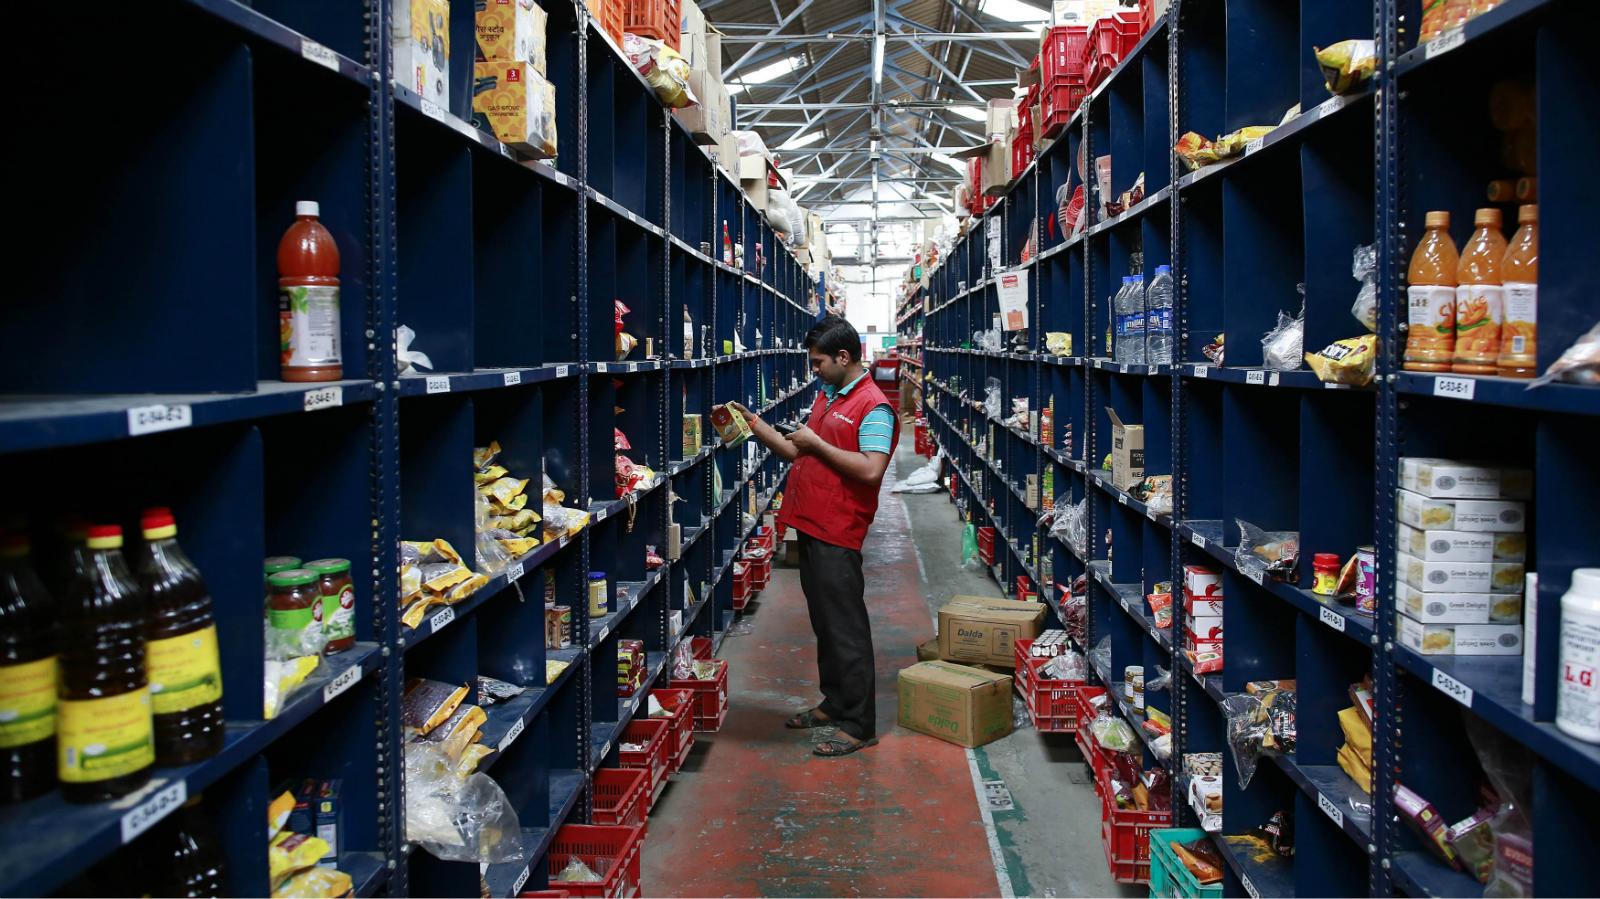 Amazon & Flipkart: Why are India's e-commerce giants